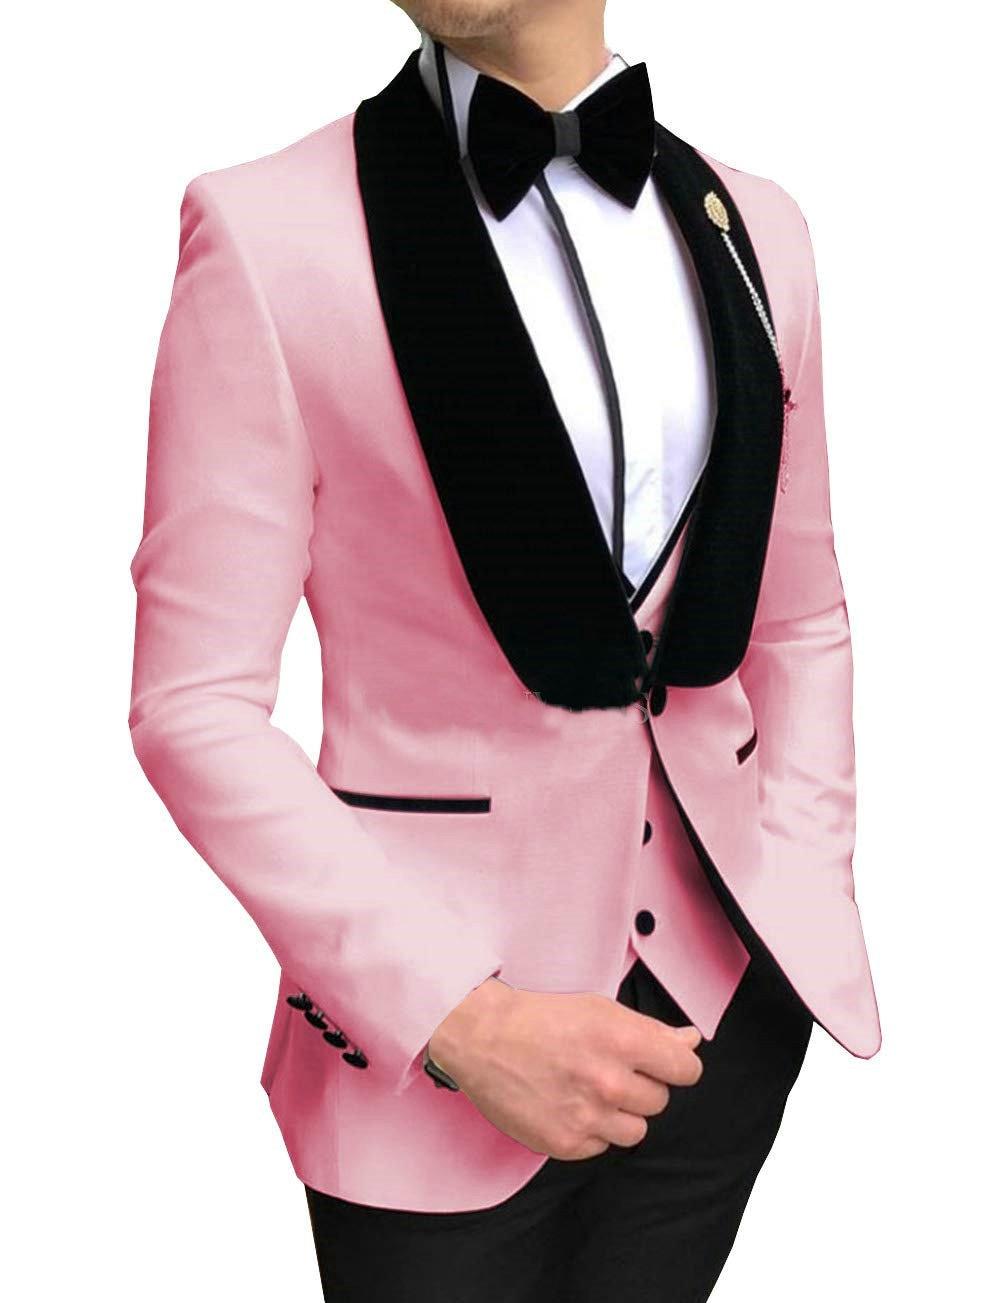 2020 Fashionable One Button Pink Groom Tuxedos Groomsmen Black Velvet Shawl Lapel Mens Wedding Suits Blazers (Jacket+Pants+Vest)